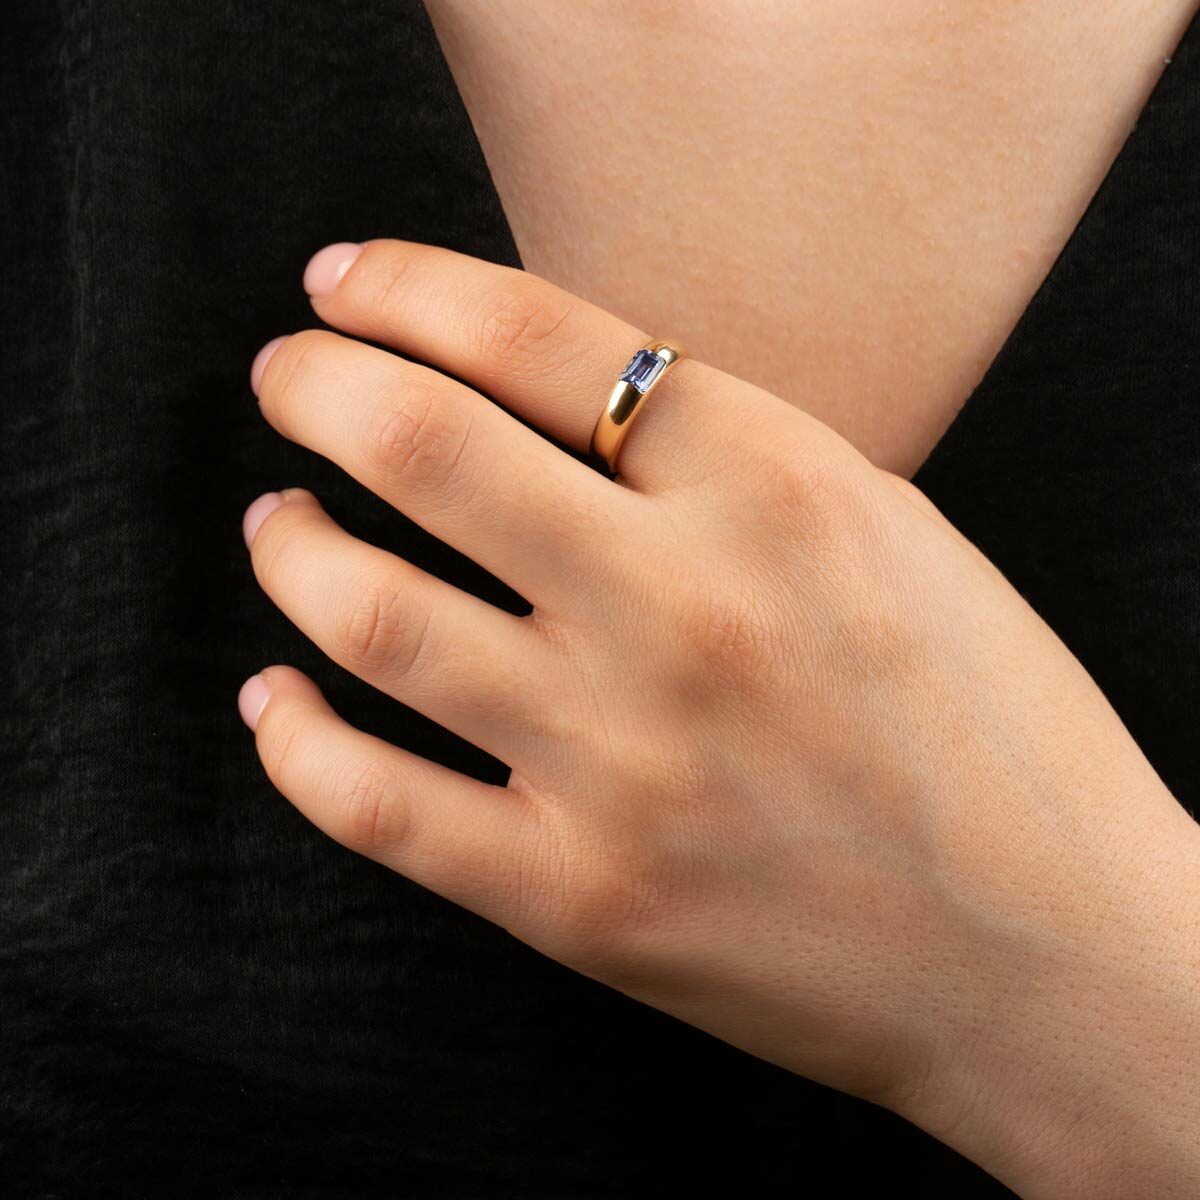 انگشتر طلا دامله نگین باگت آبی